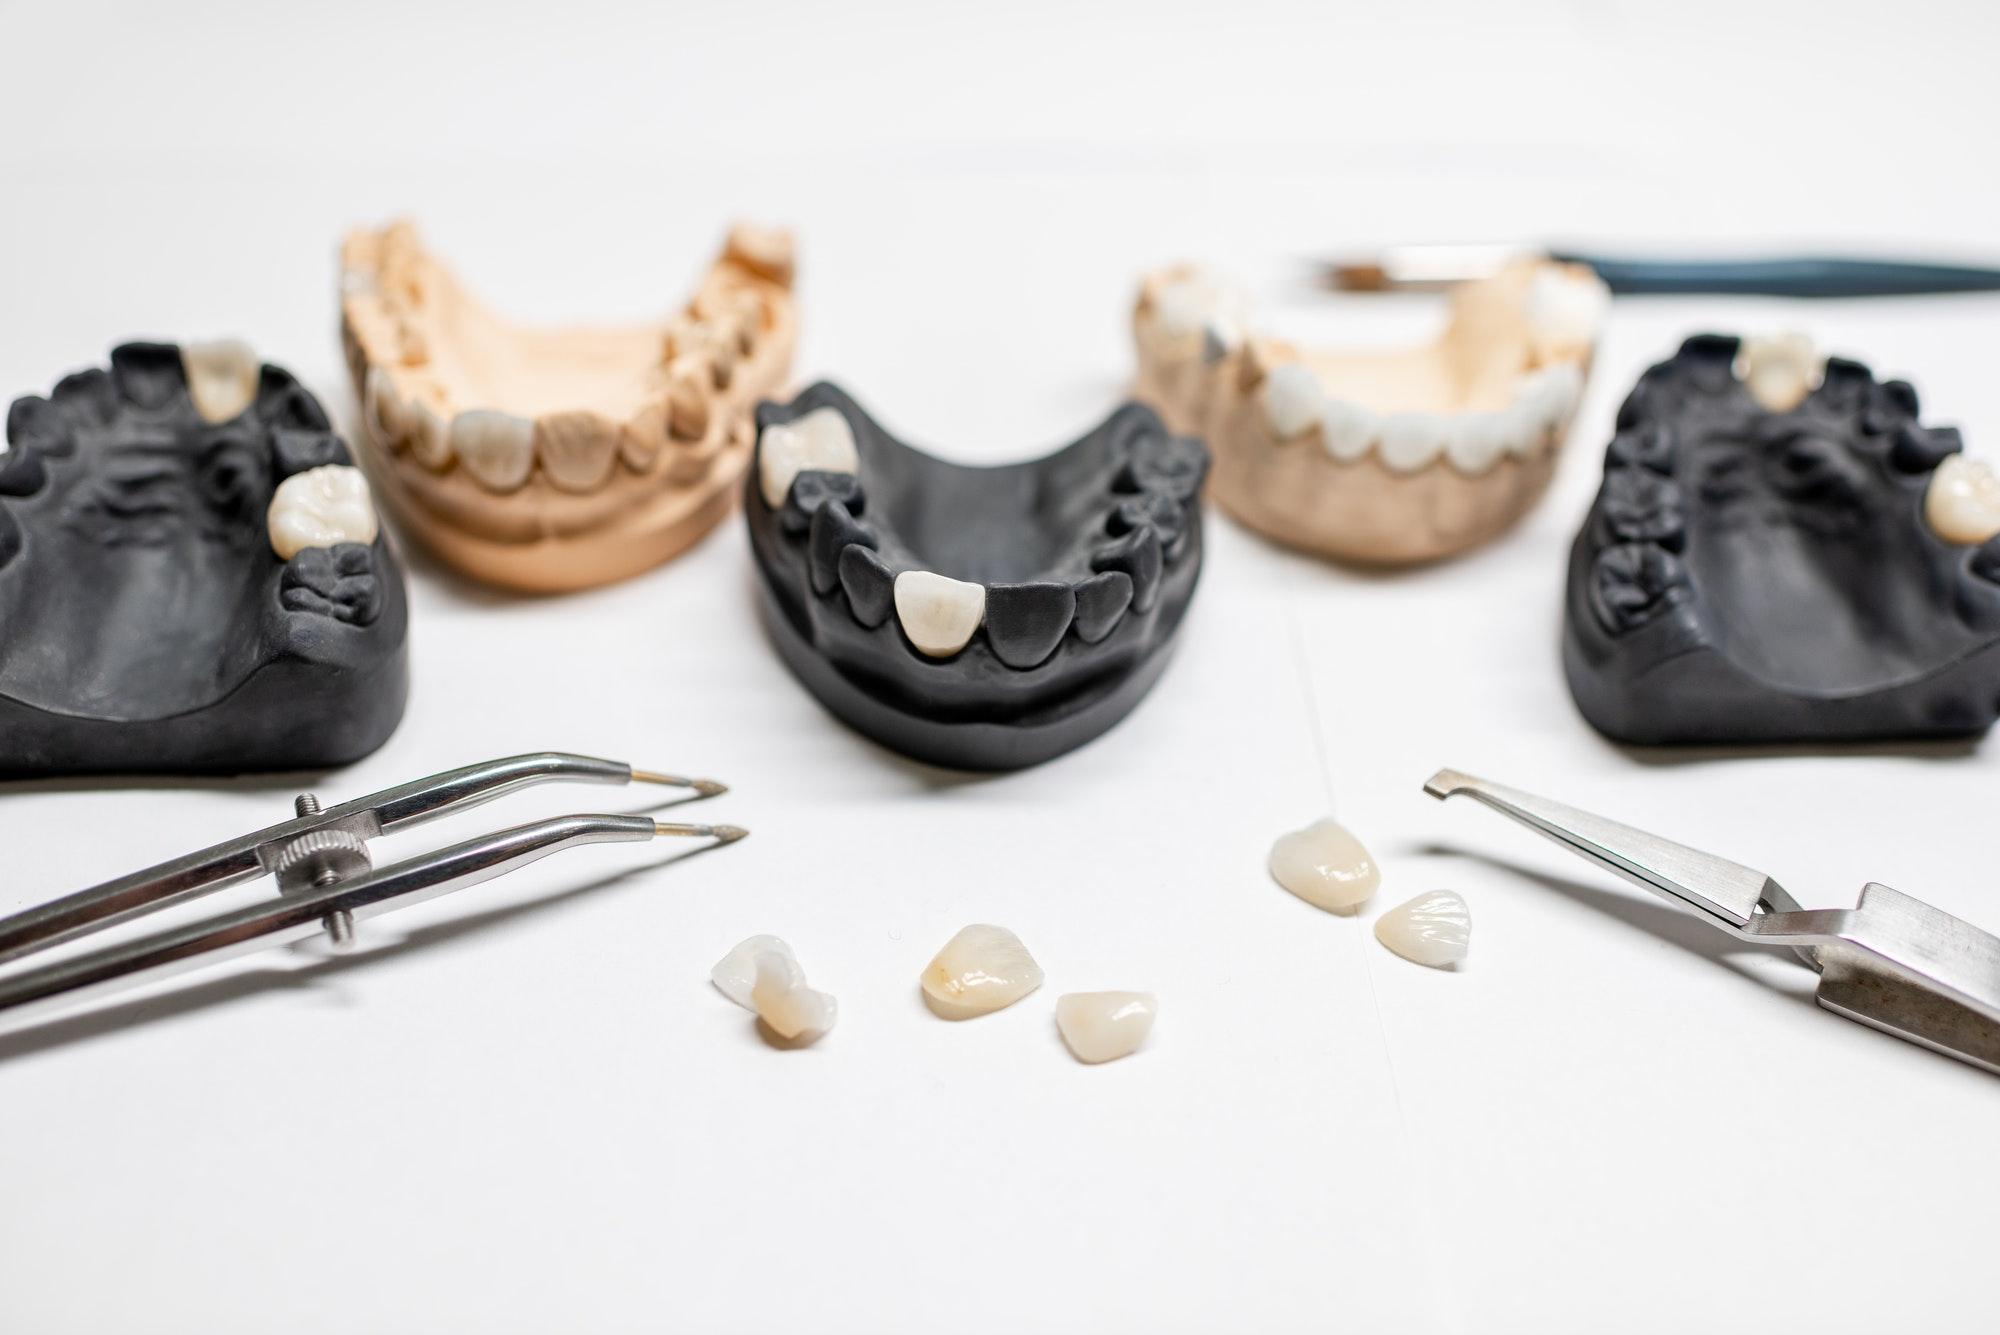 Artificial jaw models with veneers